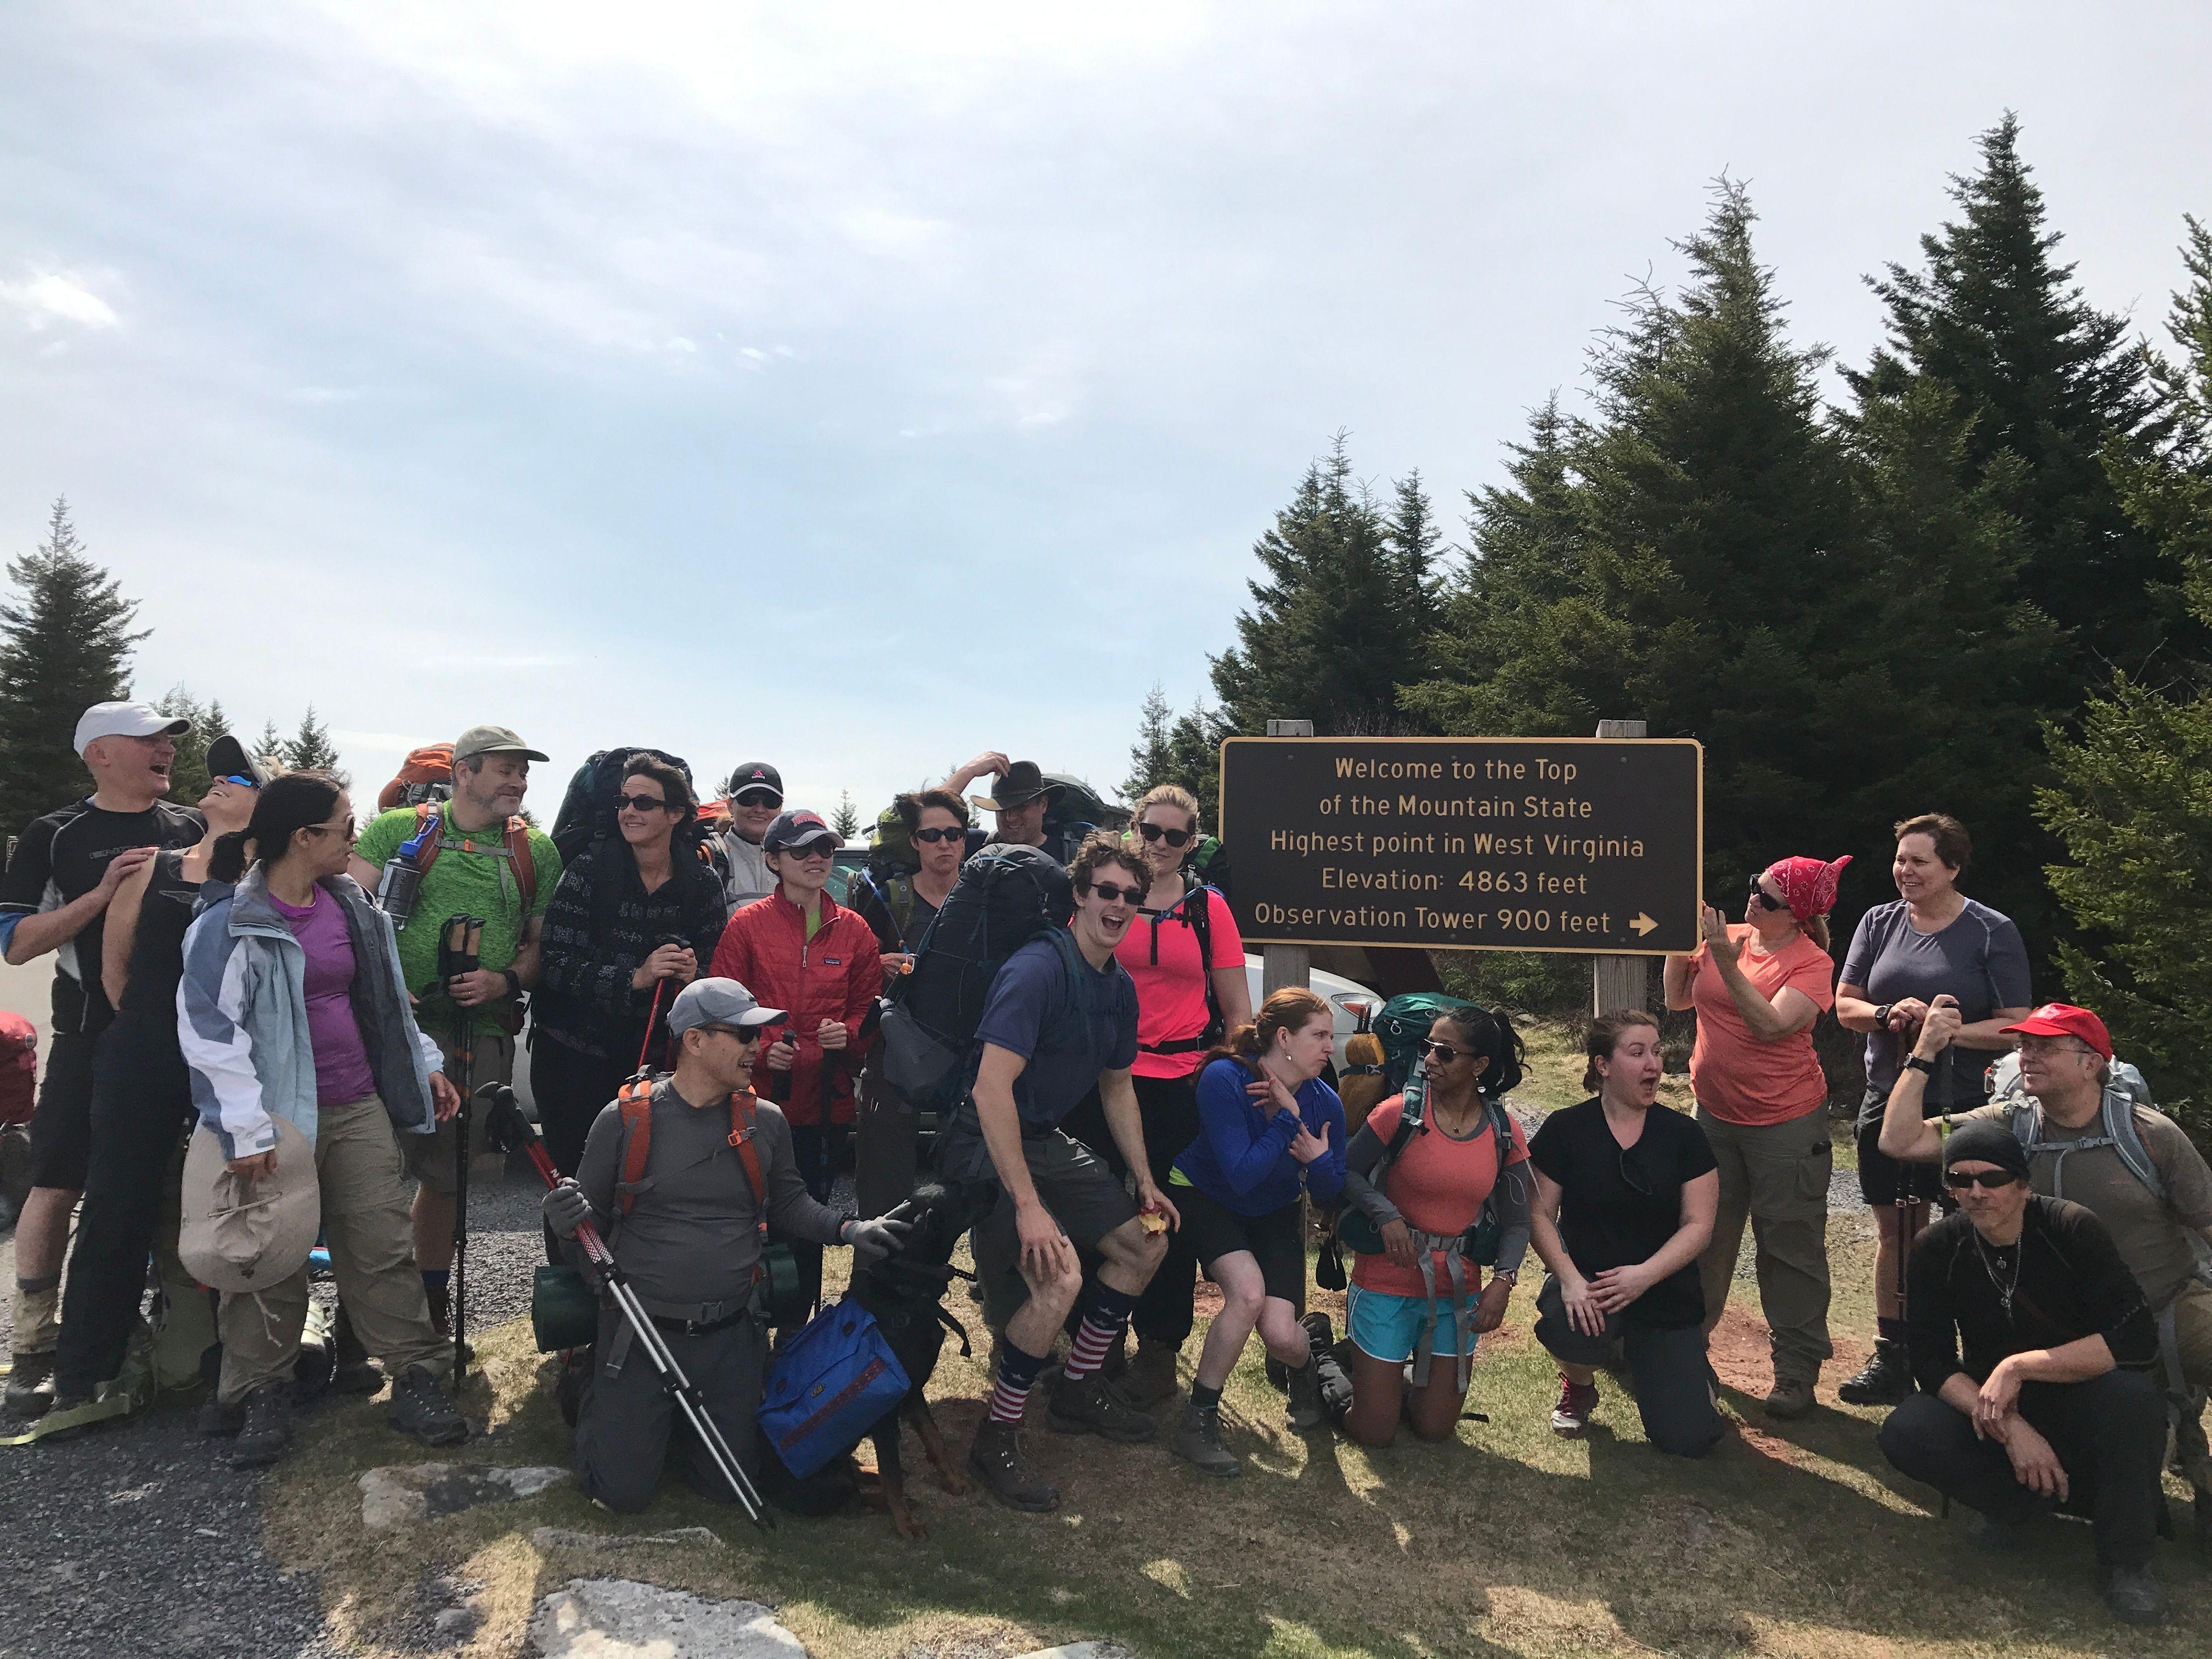 The Washington Backpackers Meetup Group